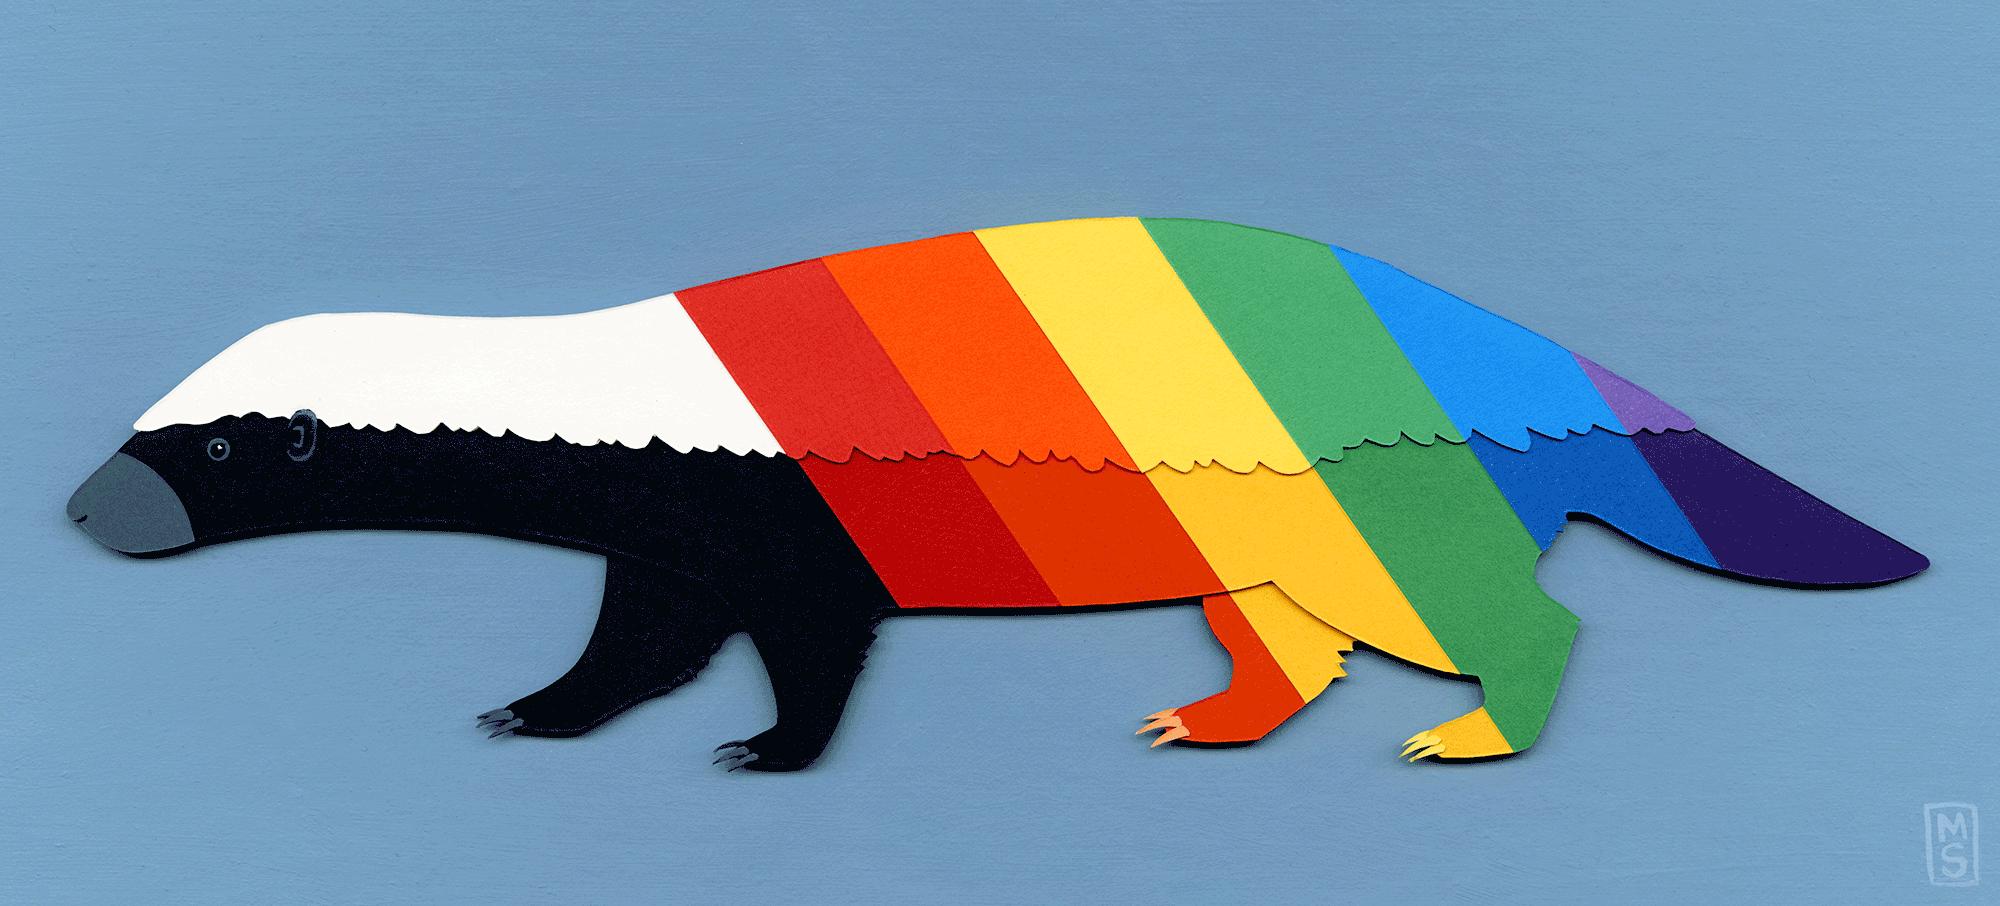 RainbowBadger_sRGB.png